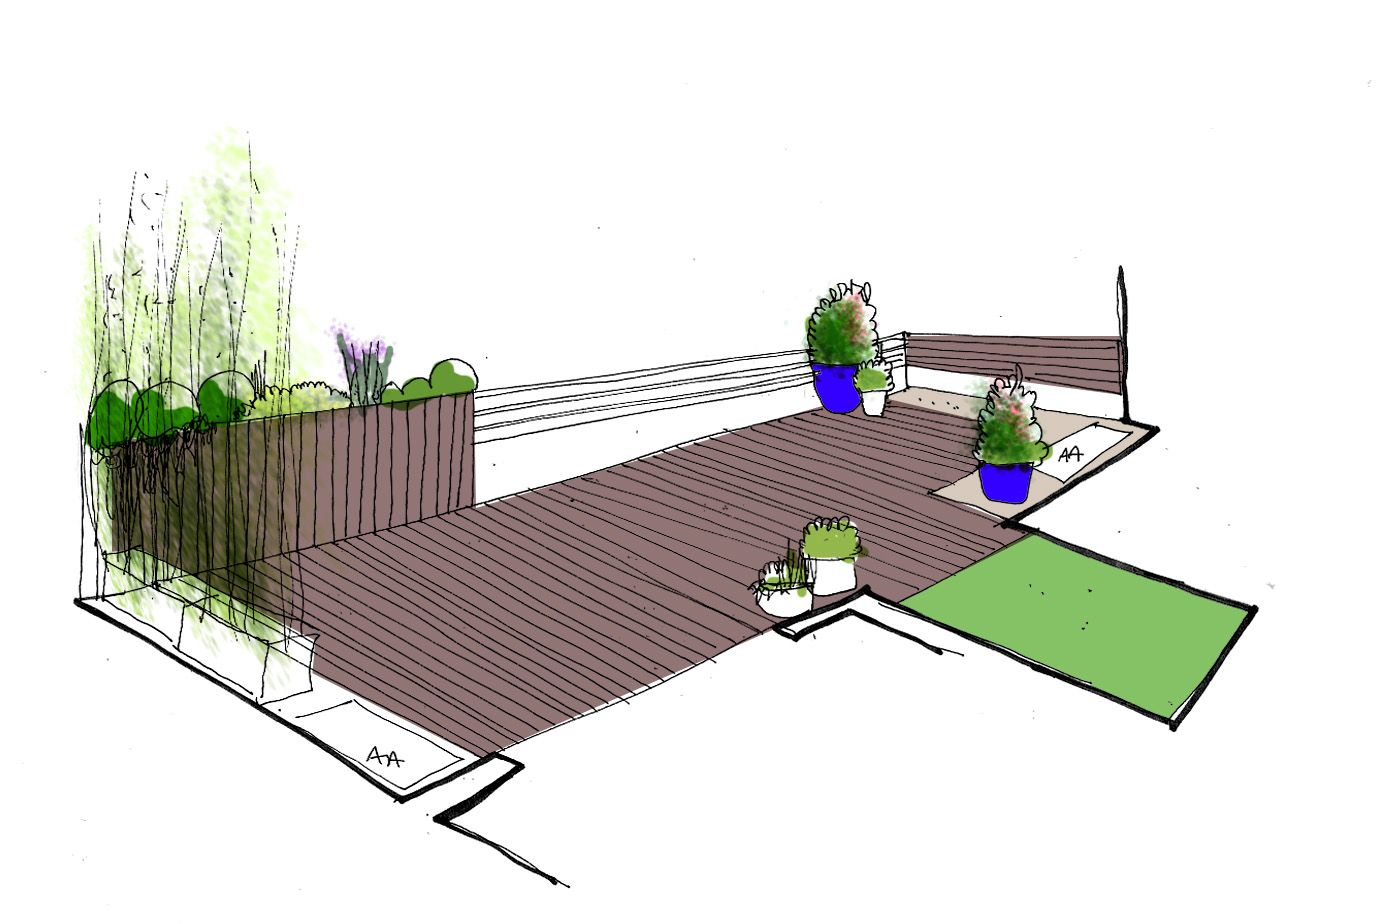 Dise o de jard n en terraza croquis jard n dise o de for Planos de jardines